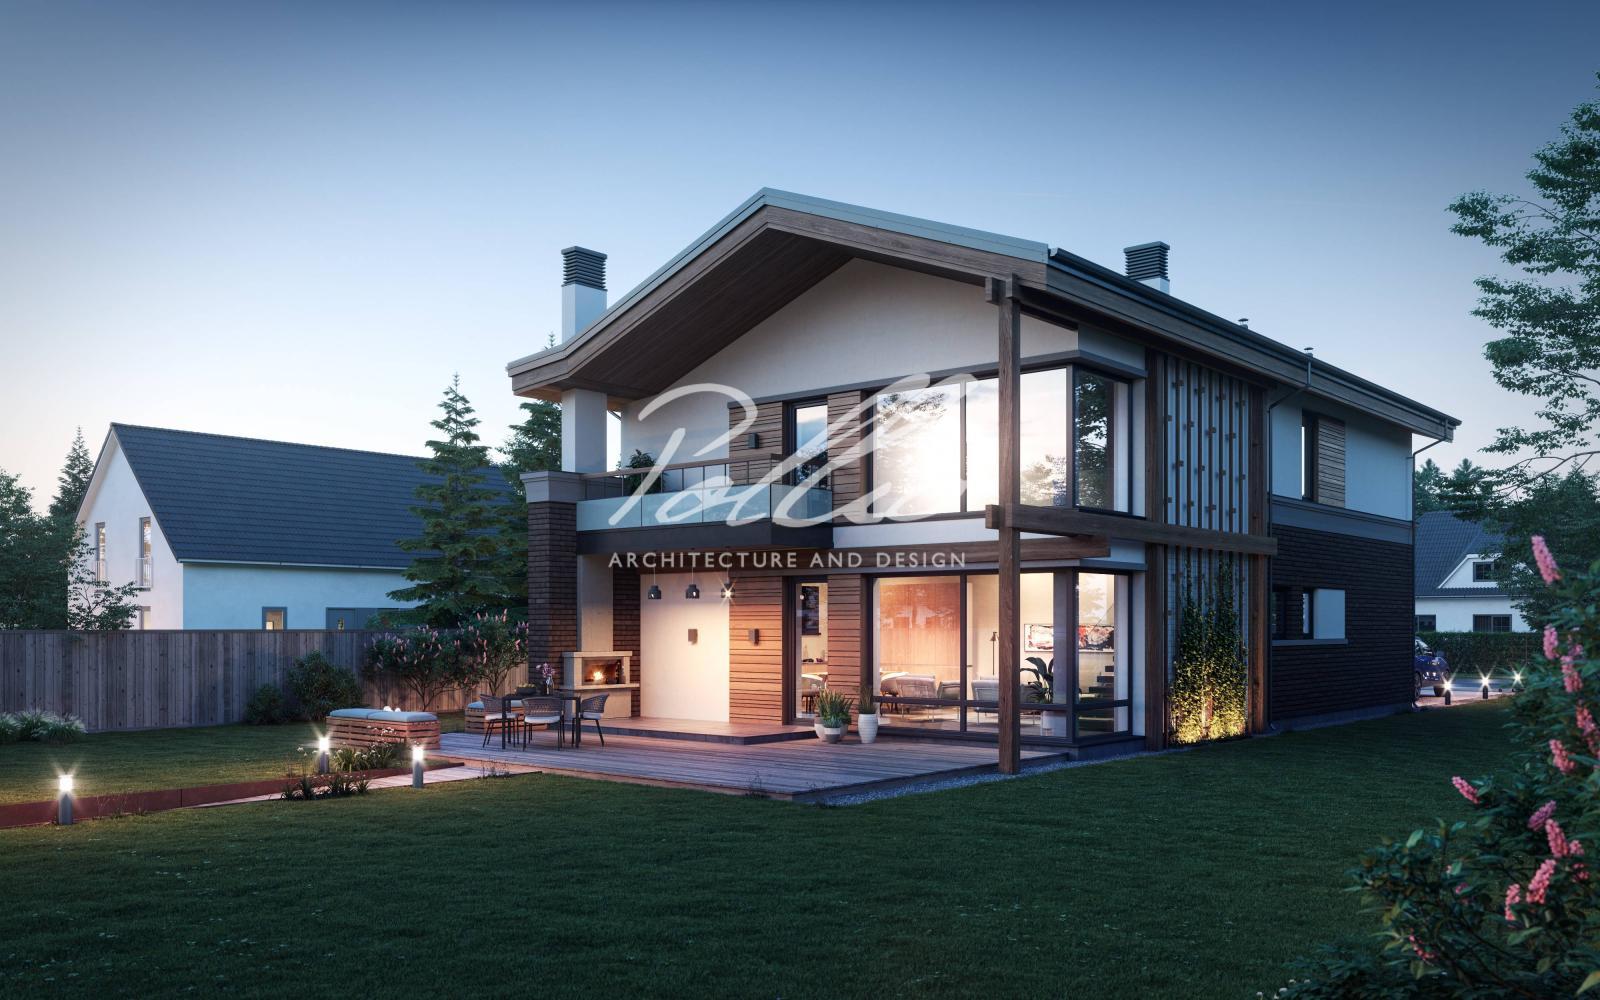 X25 Современный проект дома для узкого участка фото 5